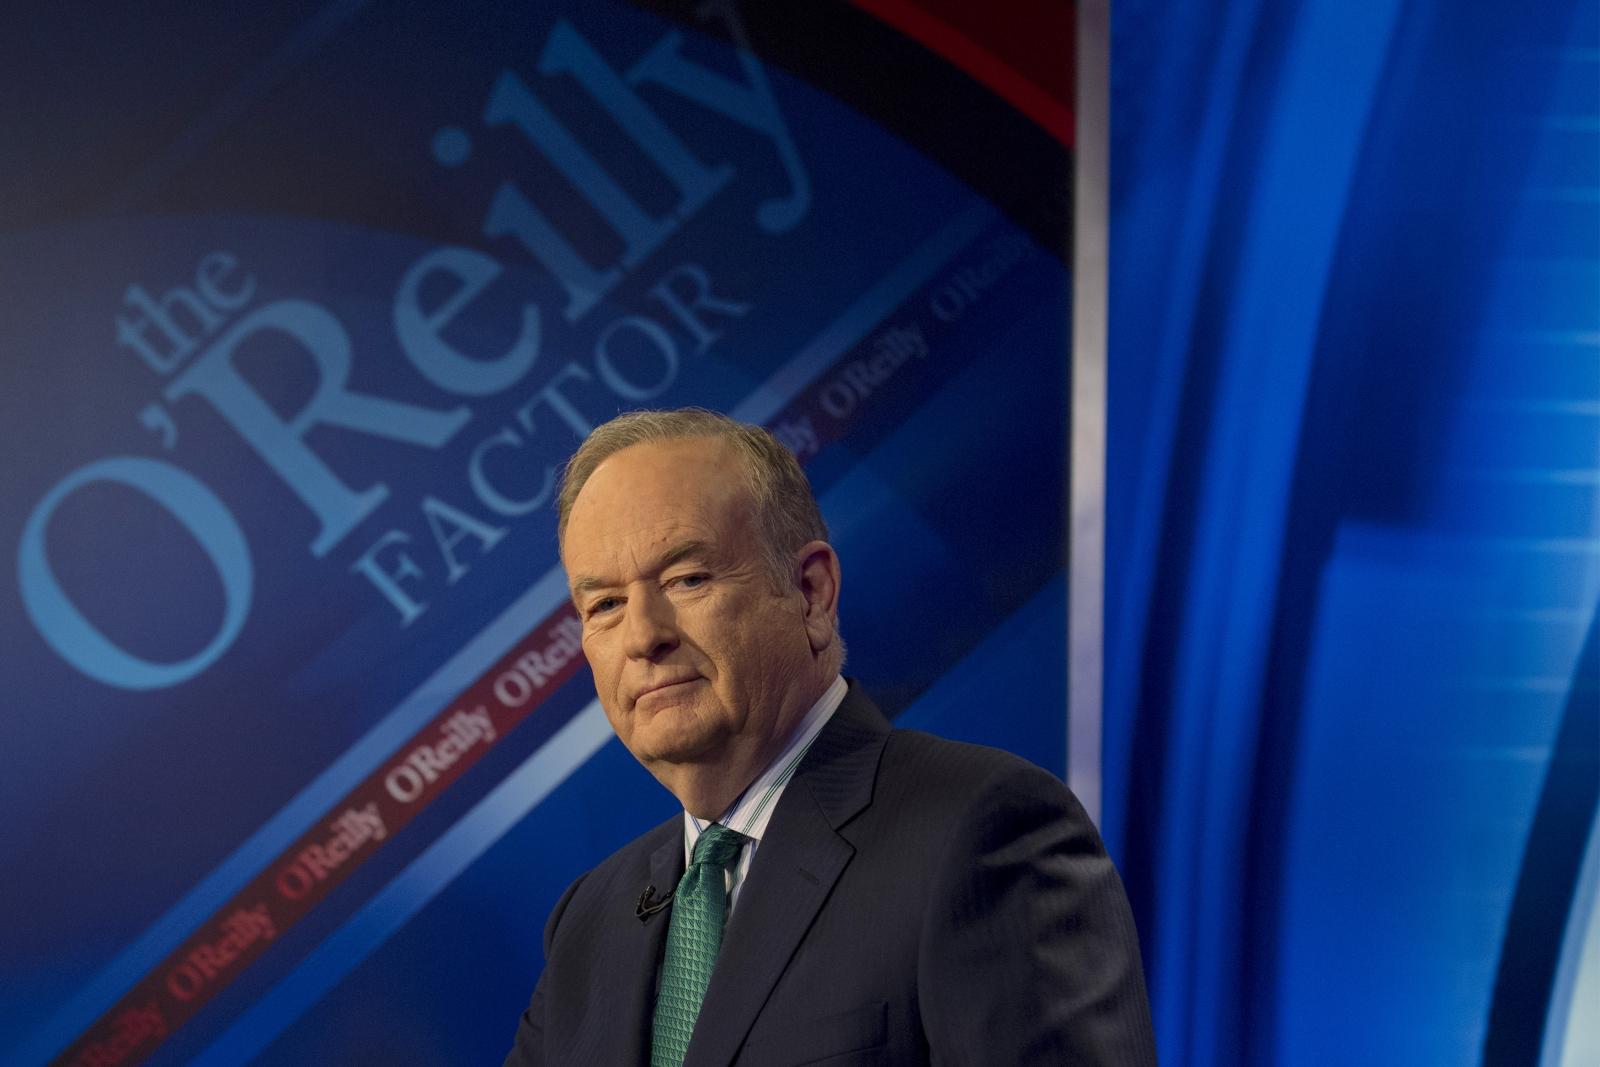 Bill O'Reilly on set